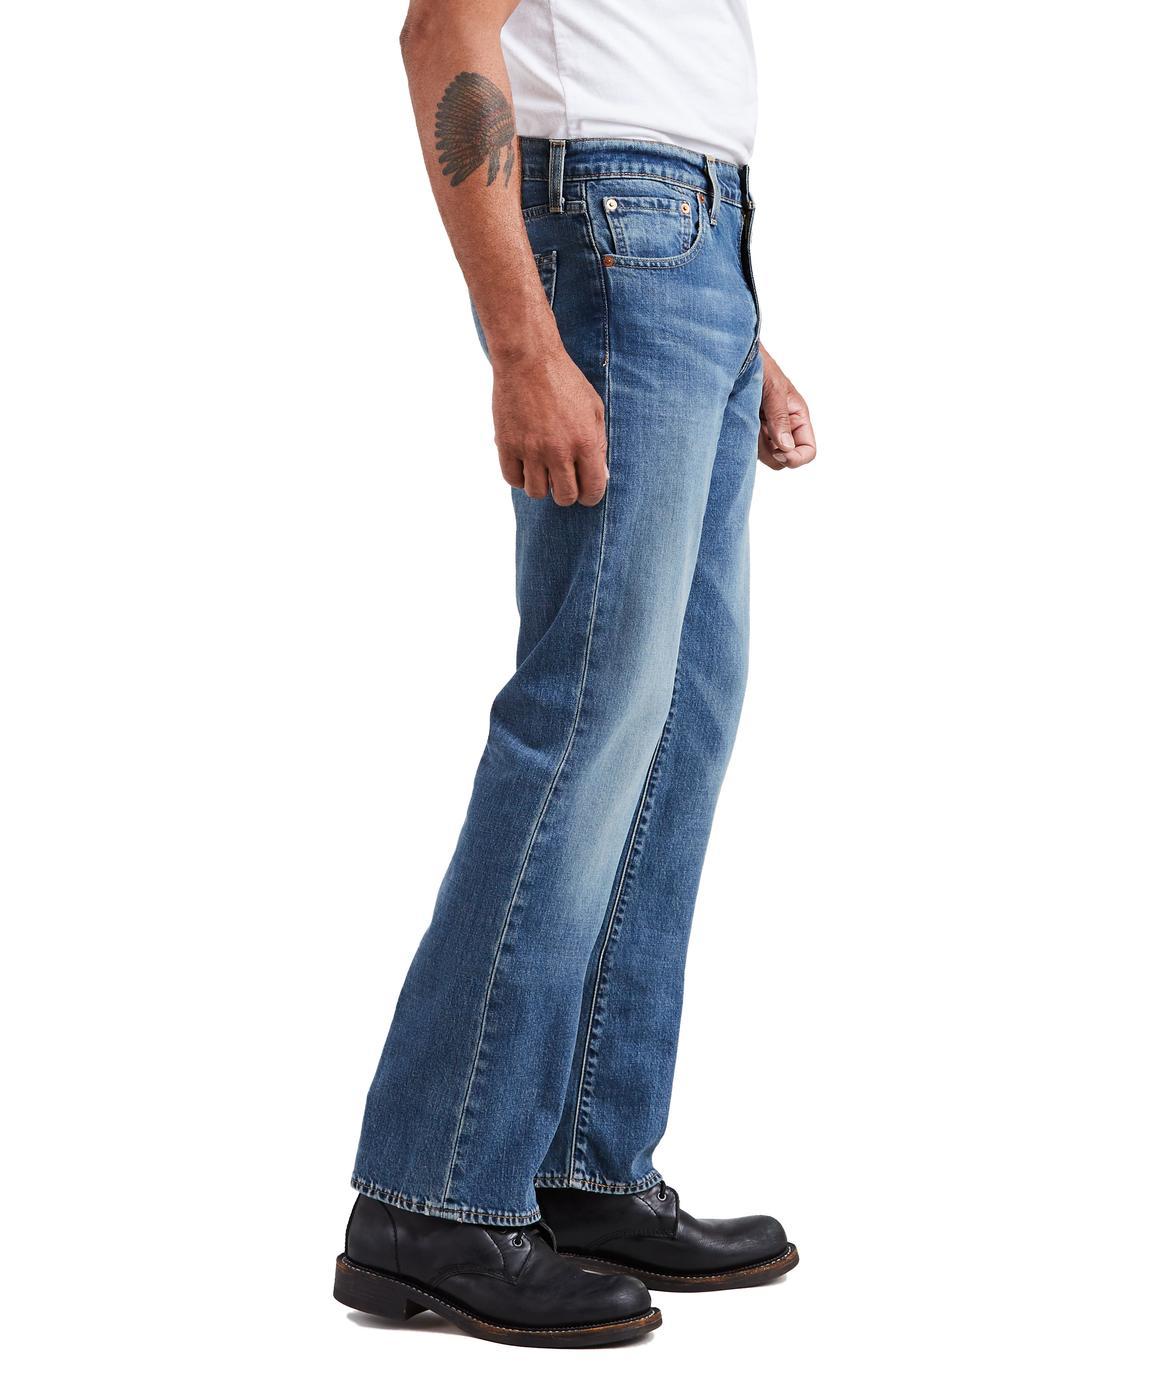 LEVI'S 527 Retro Men's Slim Bootcut Jeans PULLEY